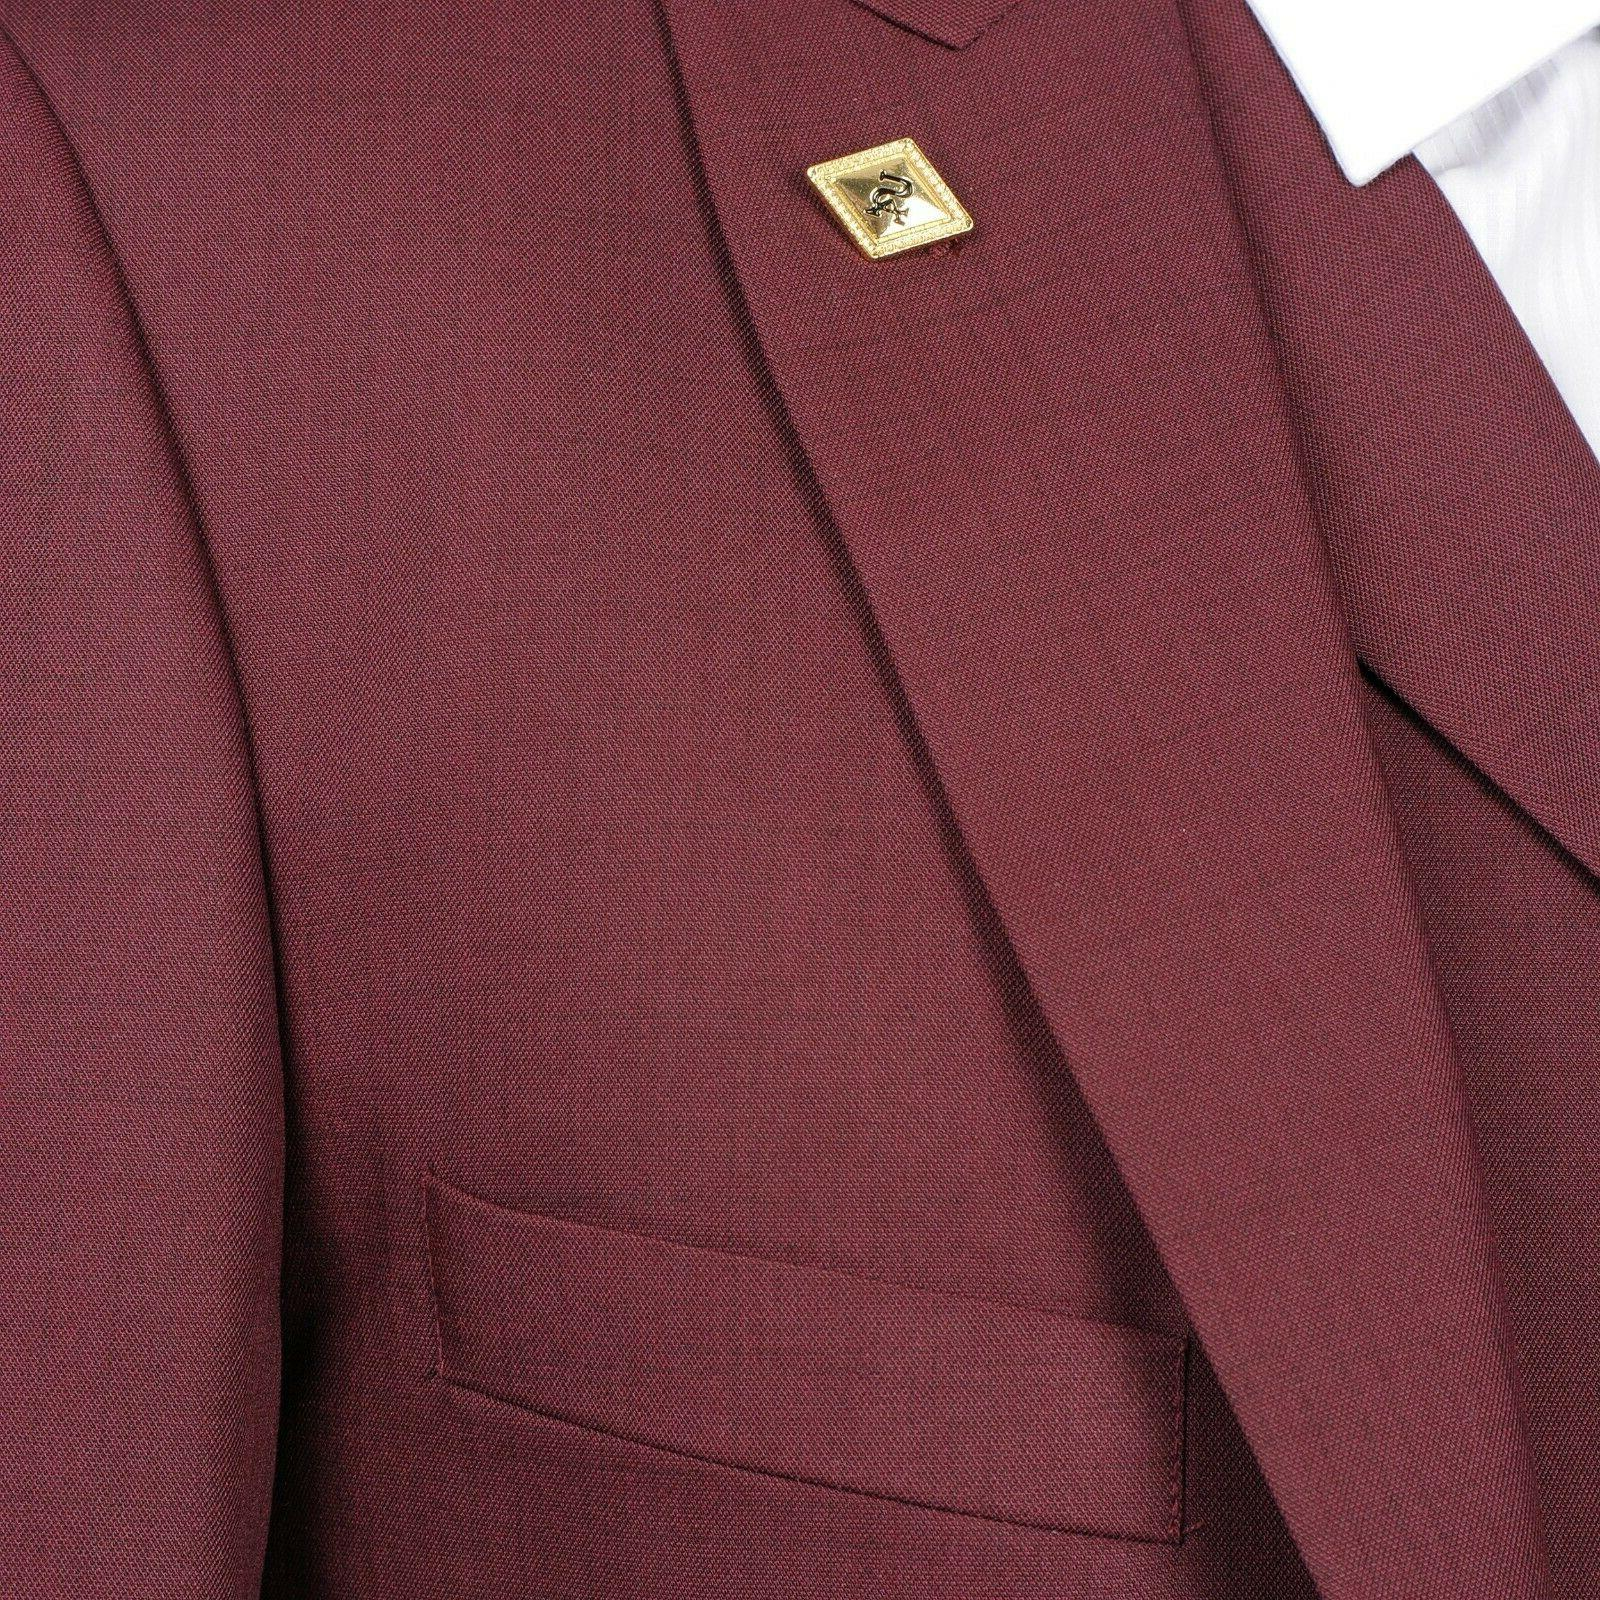 Brand New Stacy Burgundy Piece Suit- Suit 29R